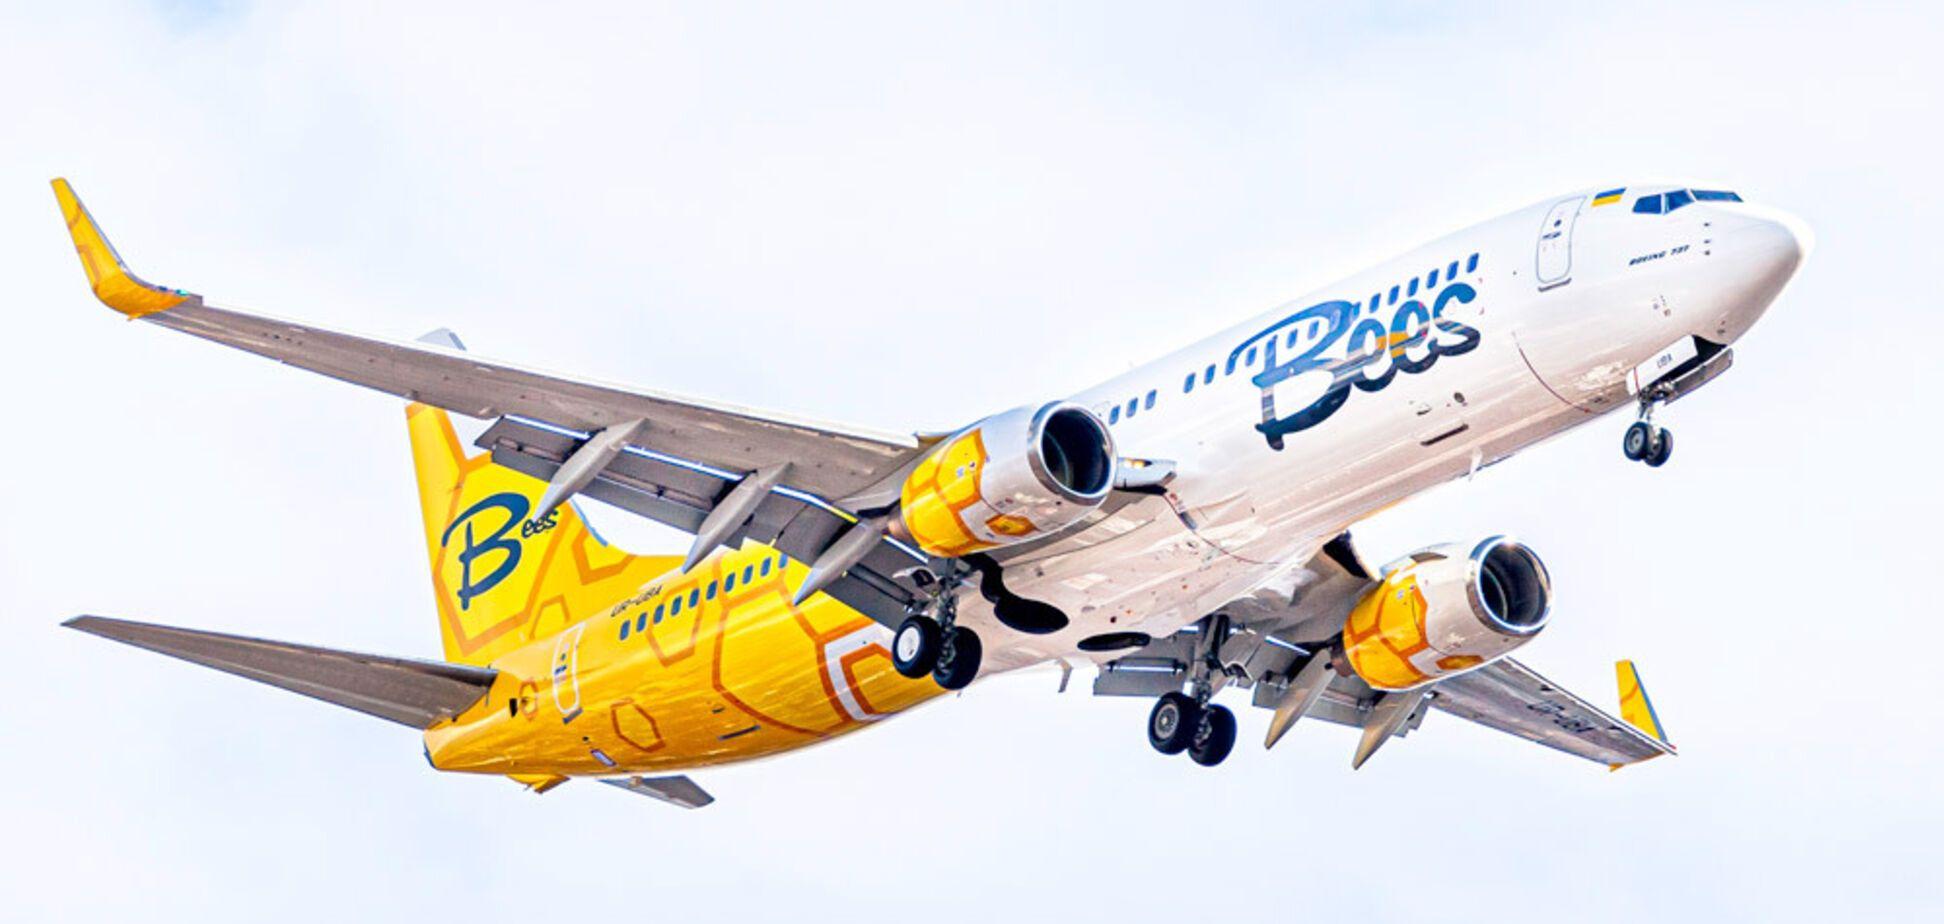 Bees Airline отримала право на польоти в Європу: список країн